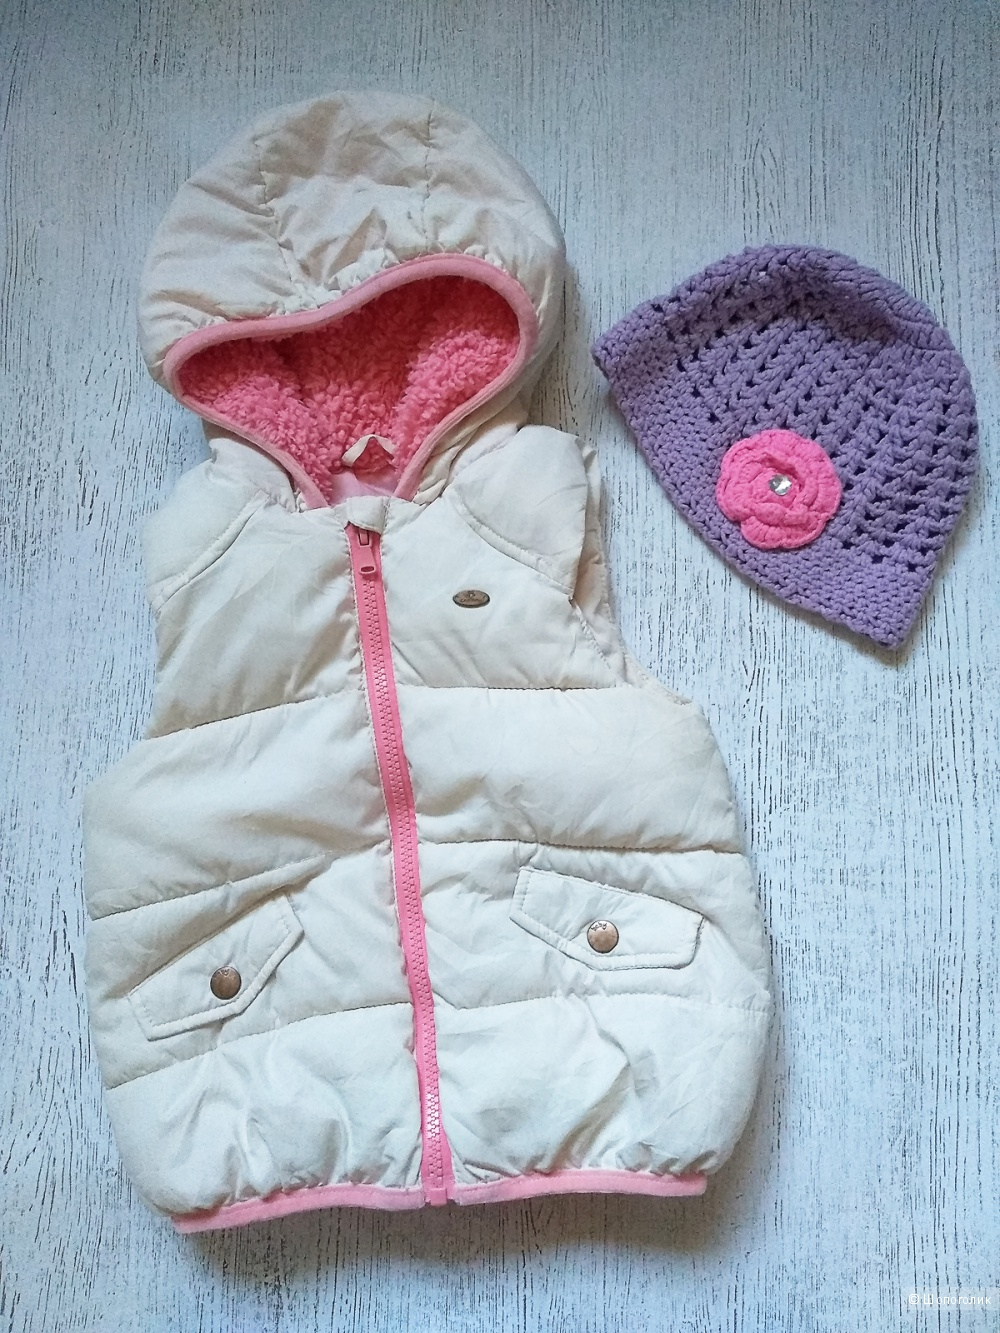 Жилетка Zara и шапка No name, на рост 92-98-104 см